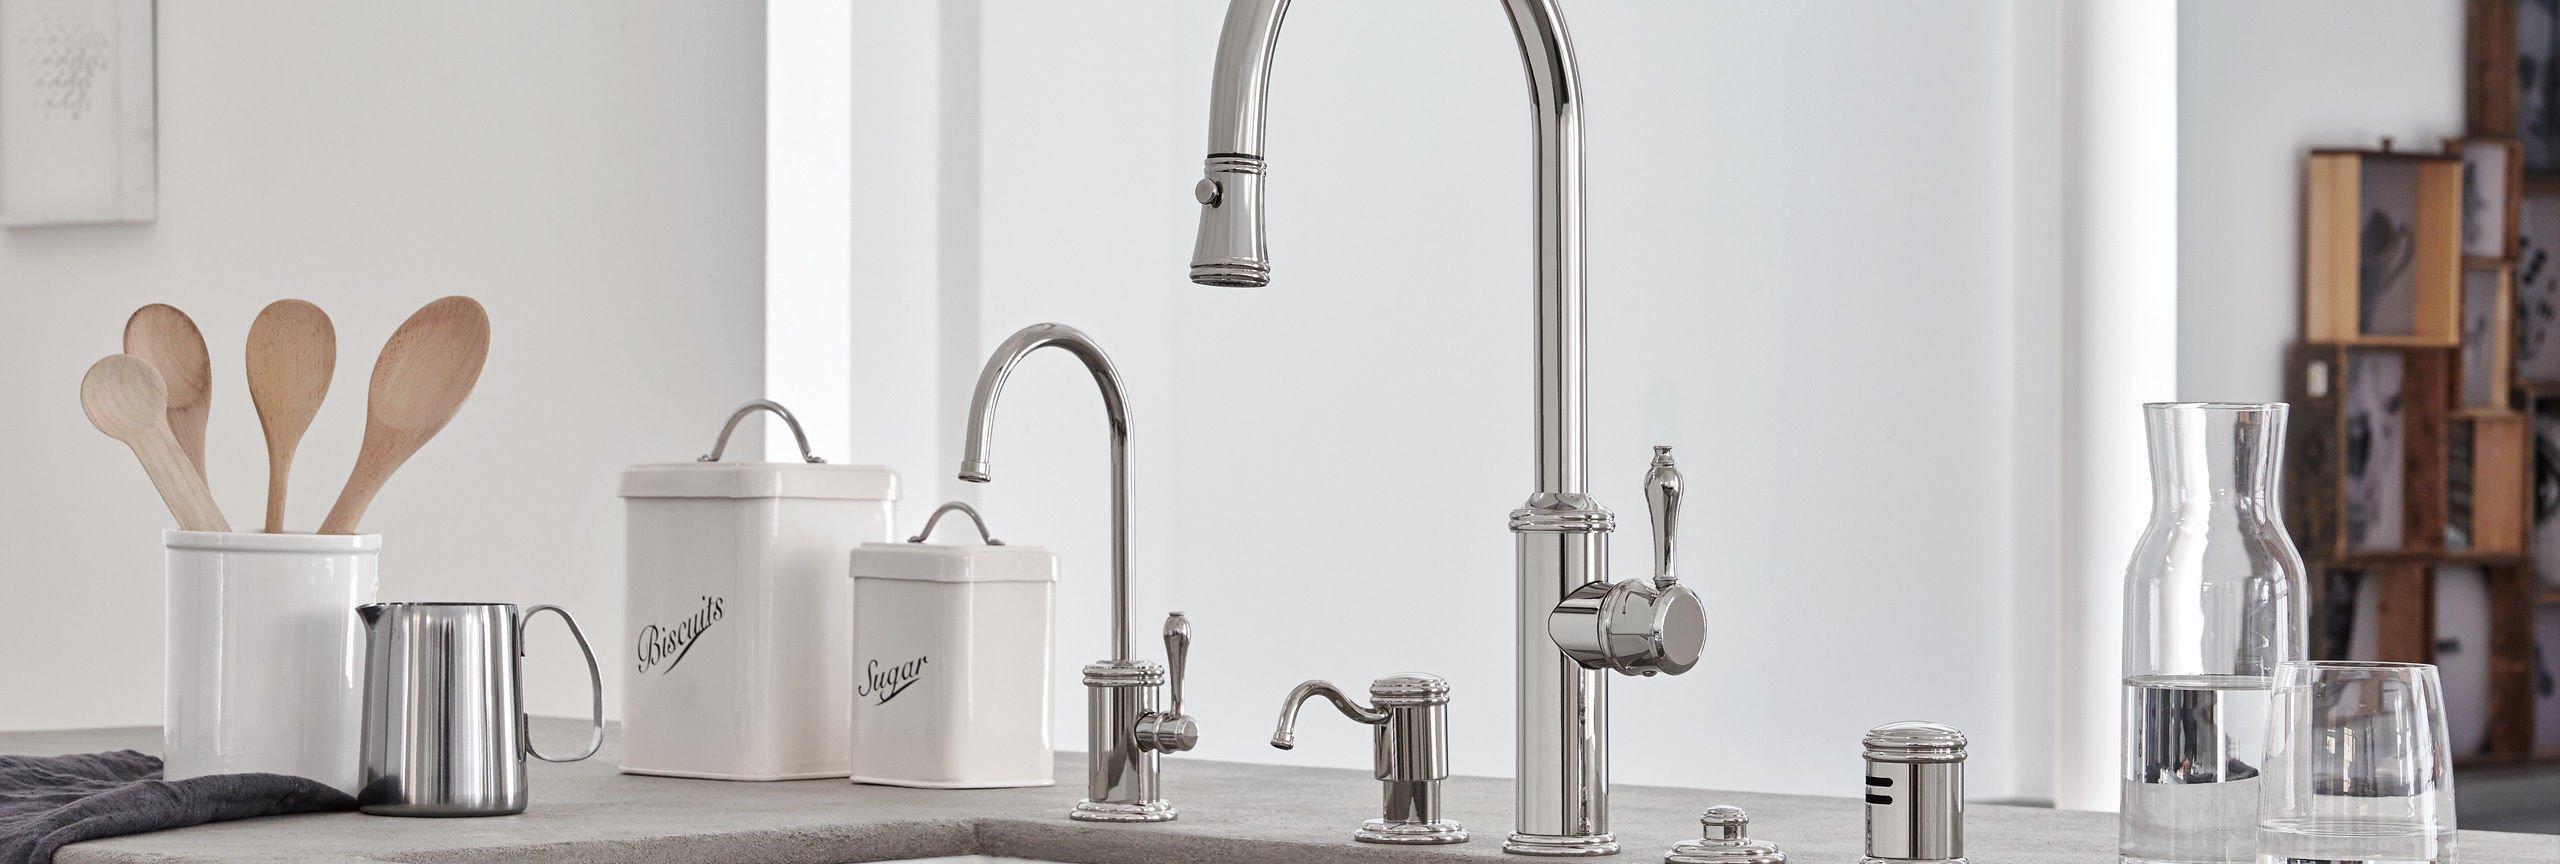 Davoli Italian Kitchen Faucets California Faucets